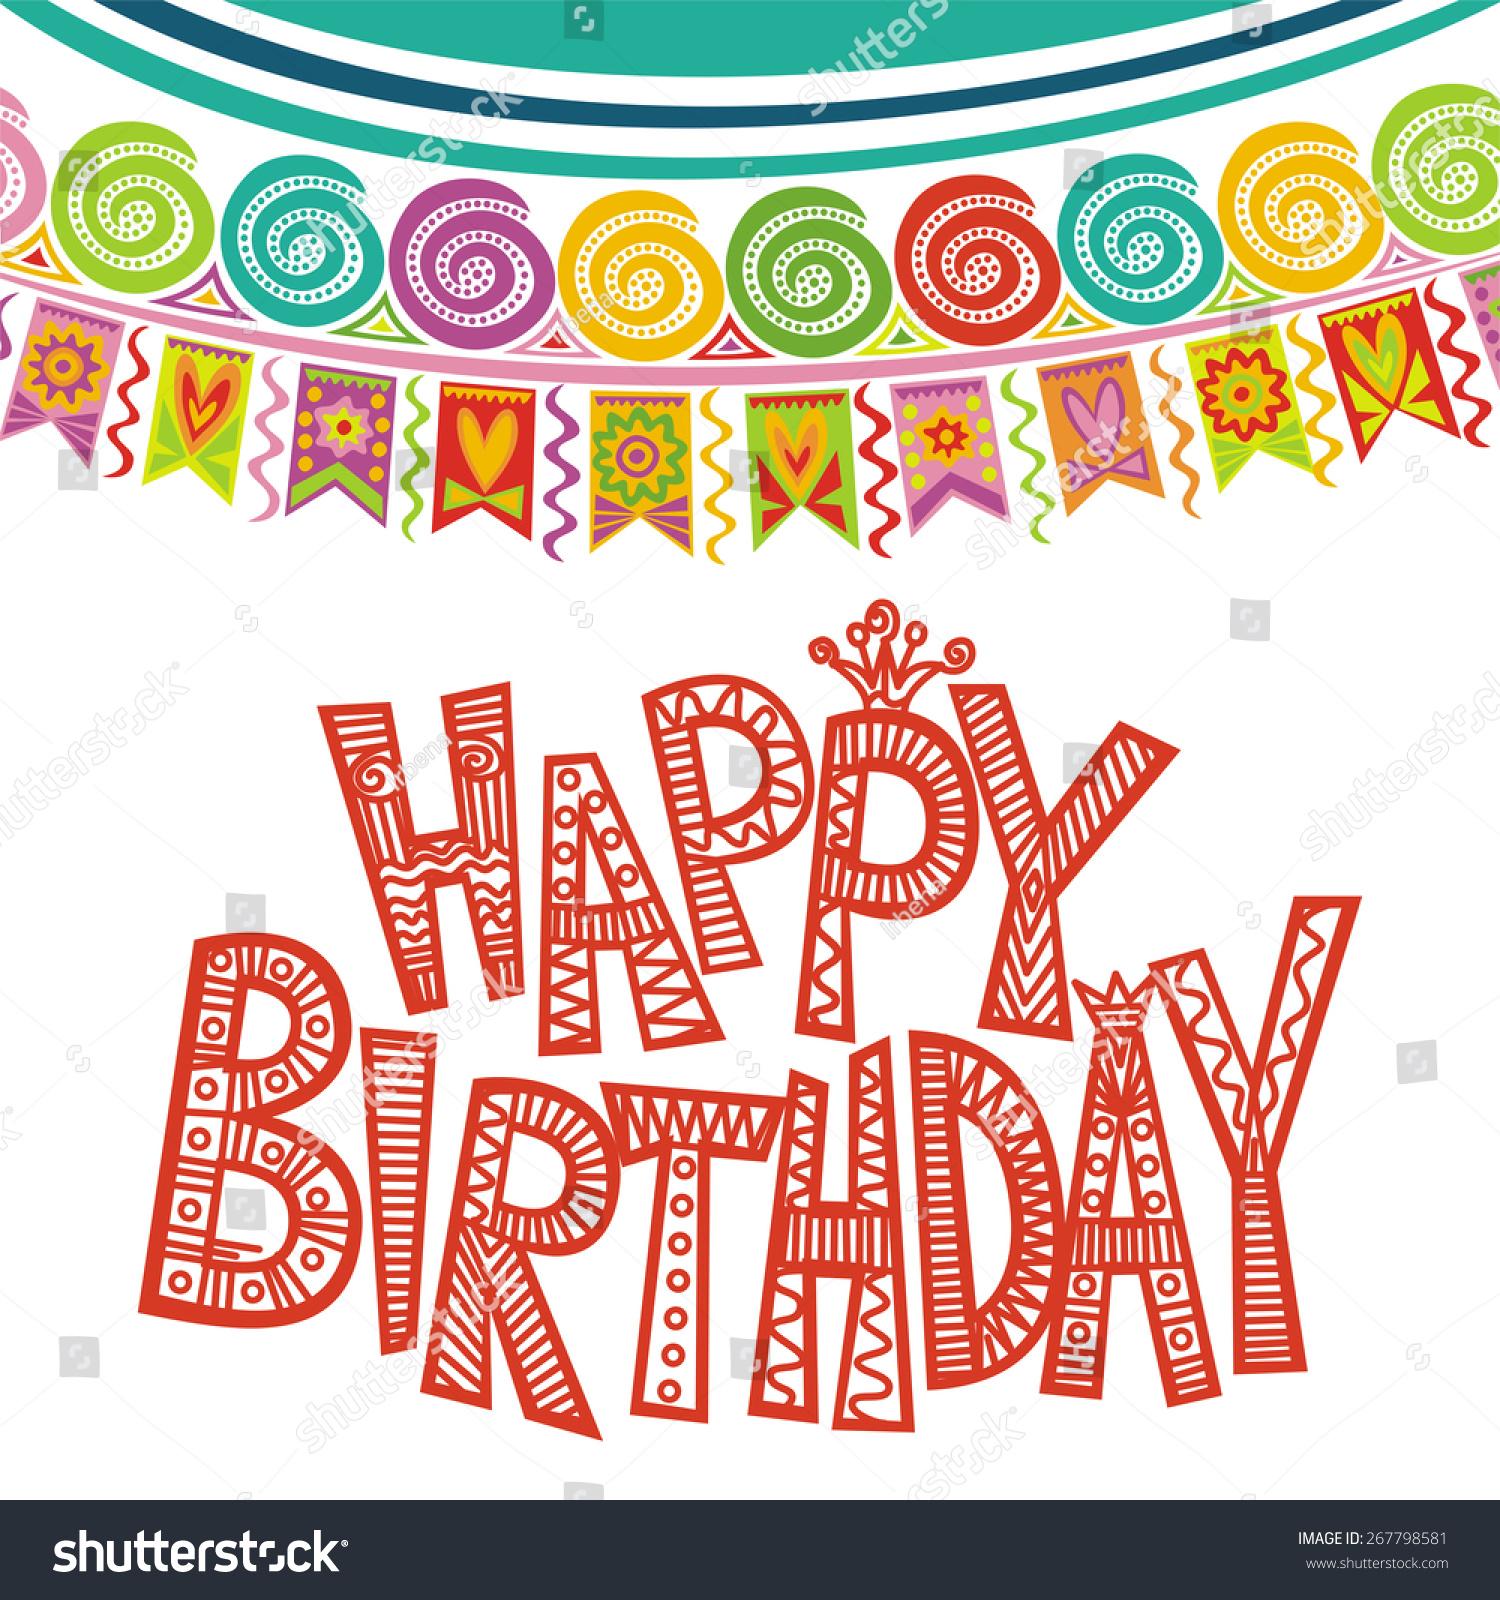 Happy Birthday Greeting Card Illustration Stock Illustration